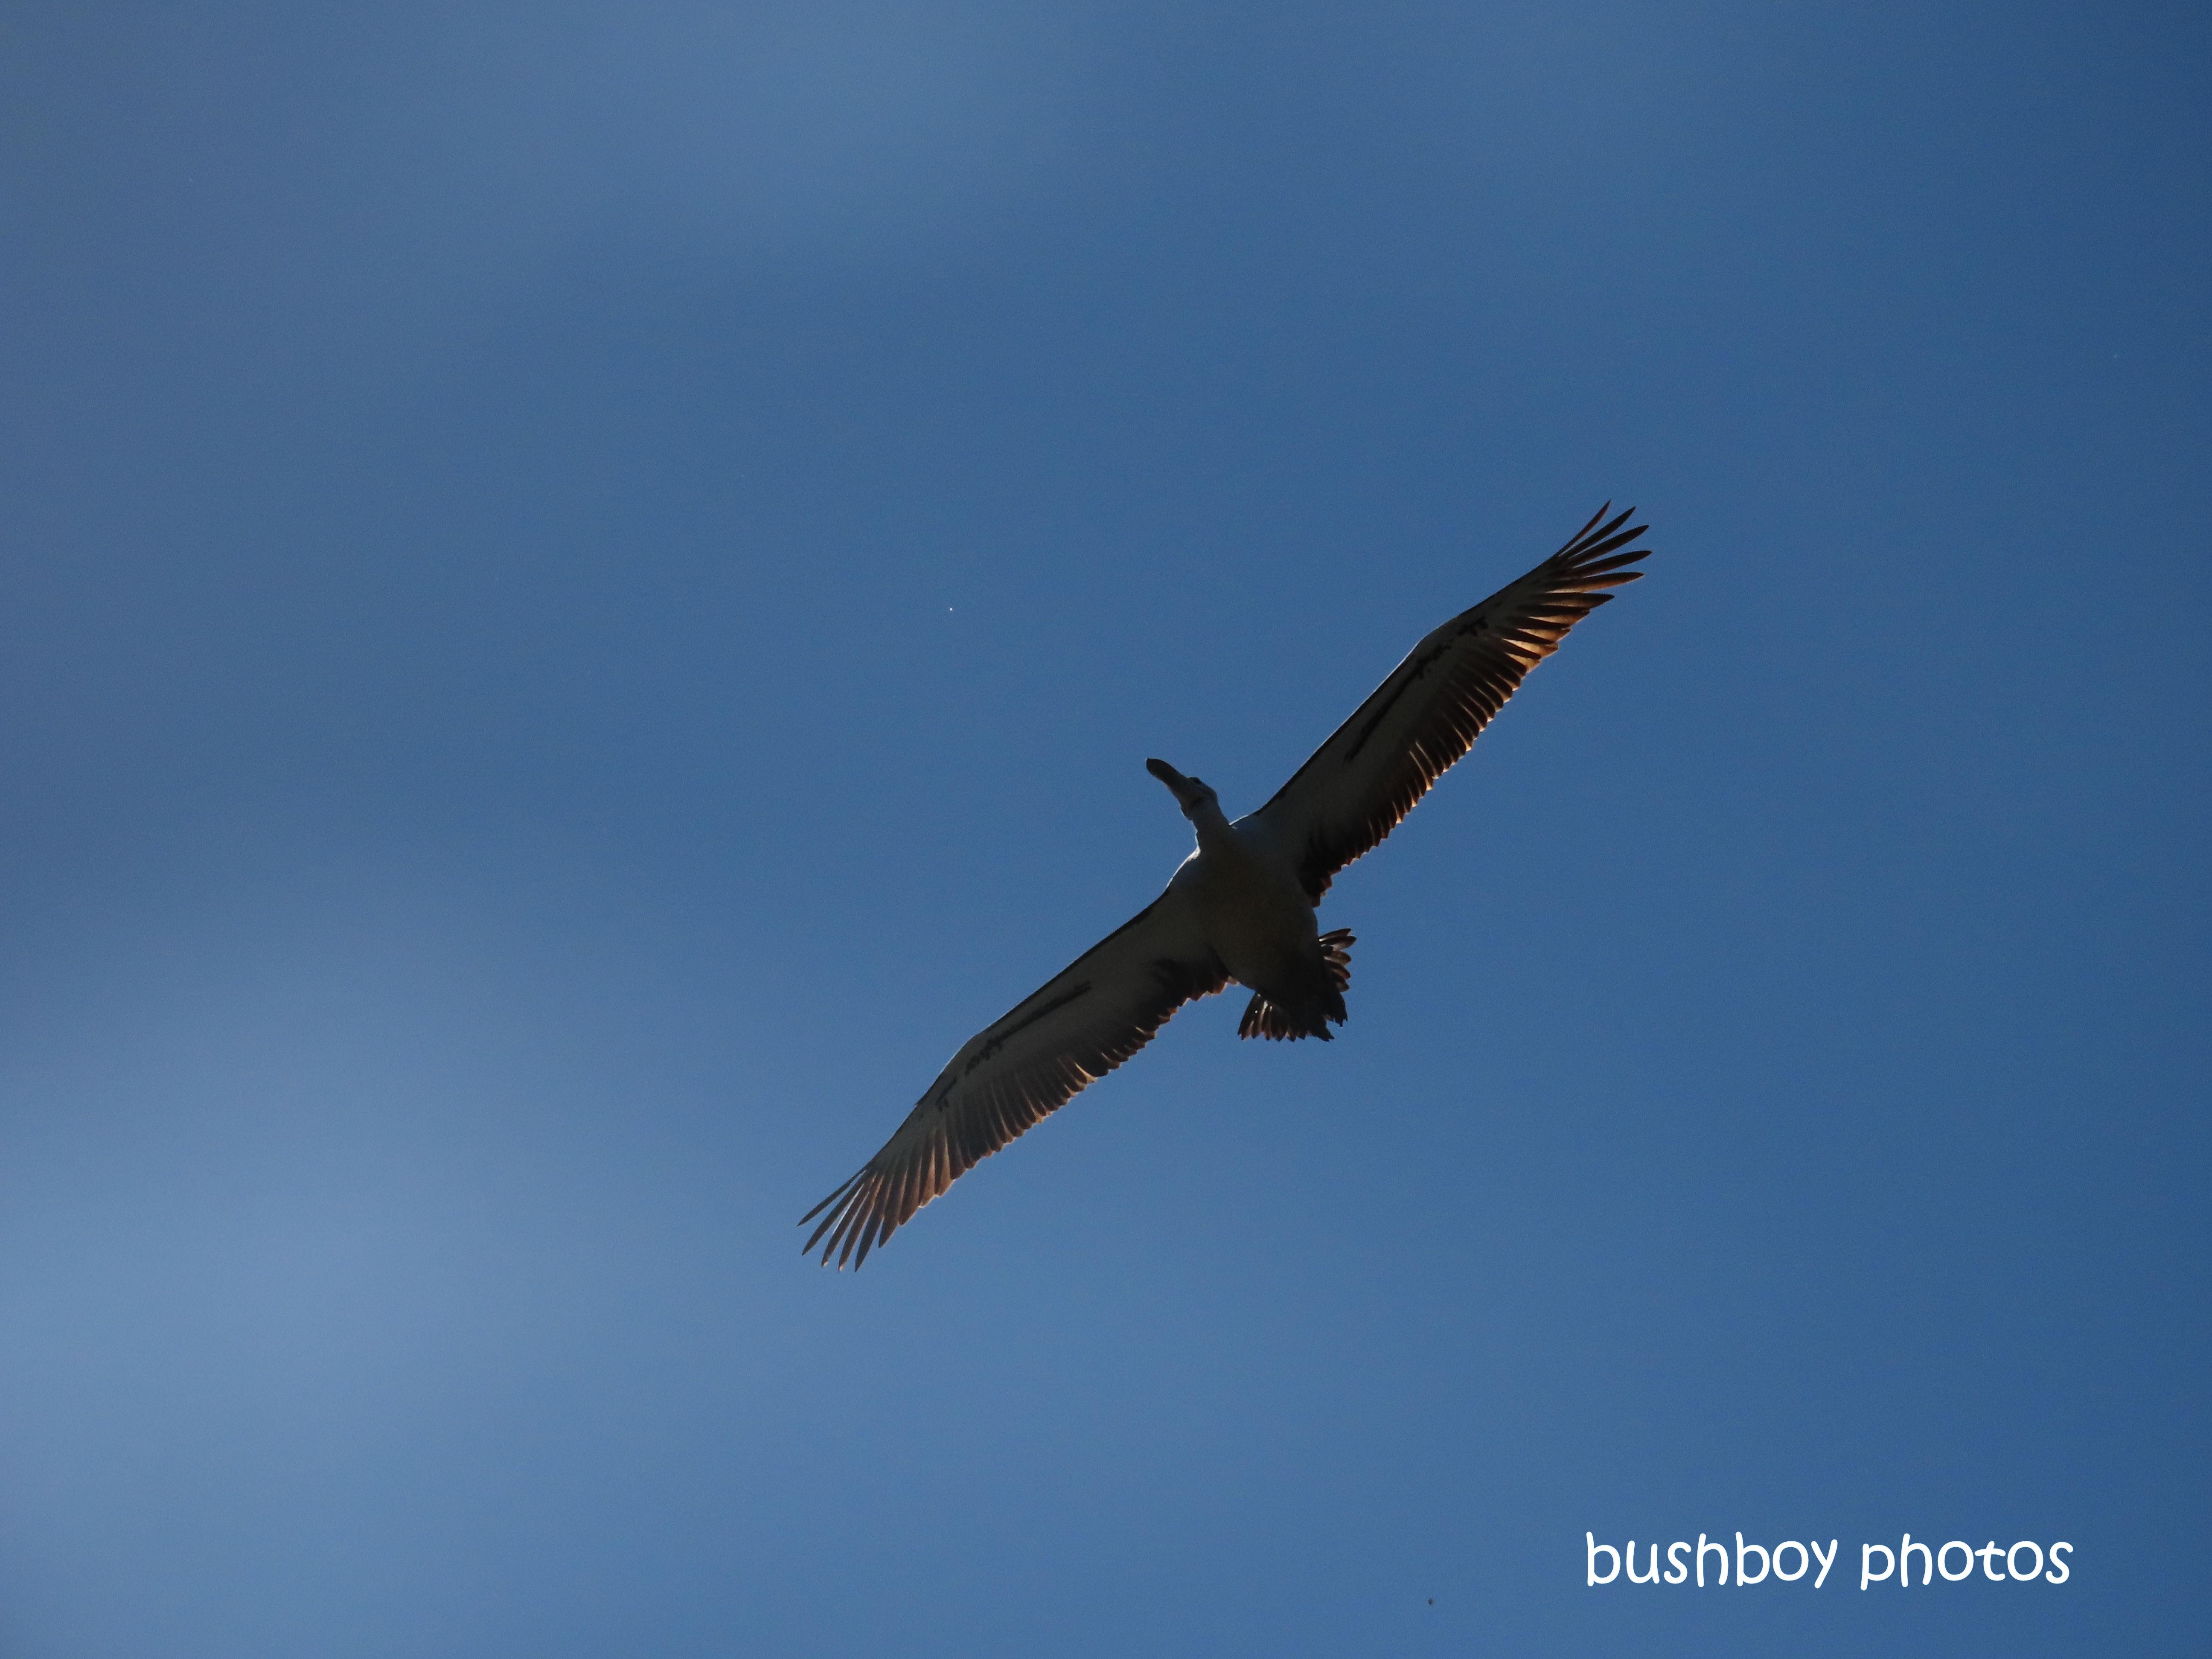 190818-blog-challenge-silent-sunday-pelican-flying-lismore-tip